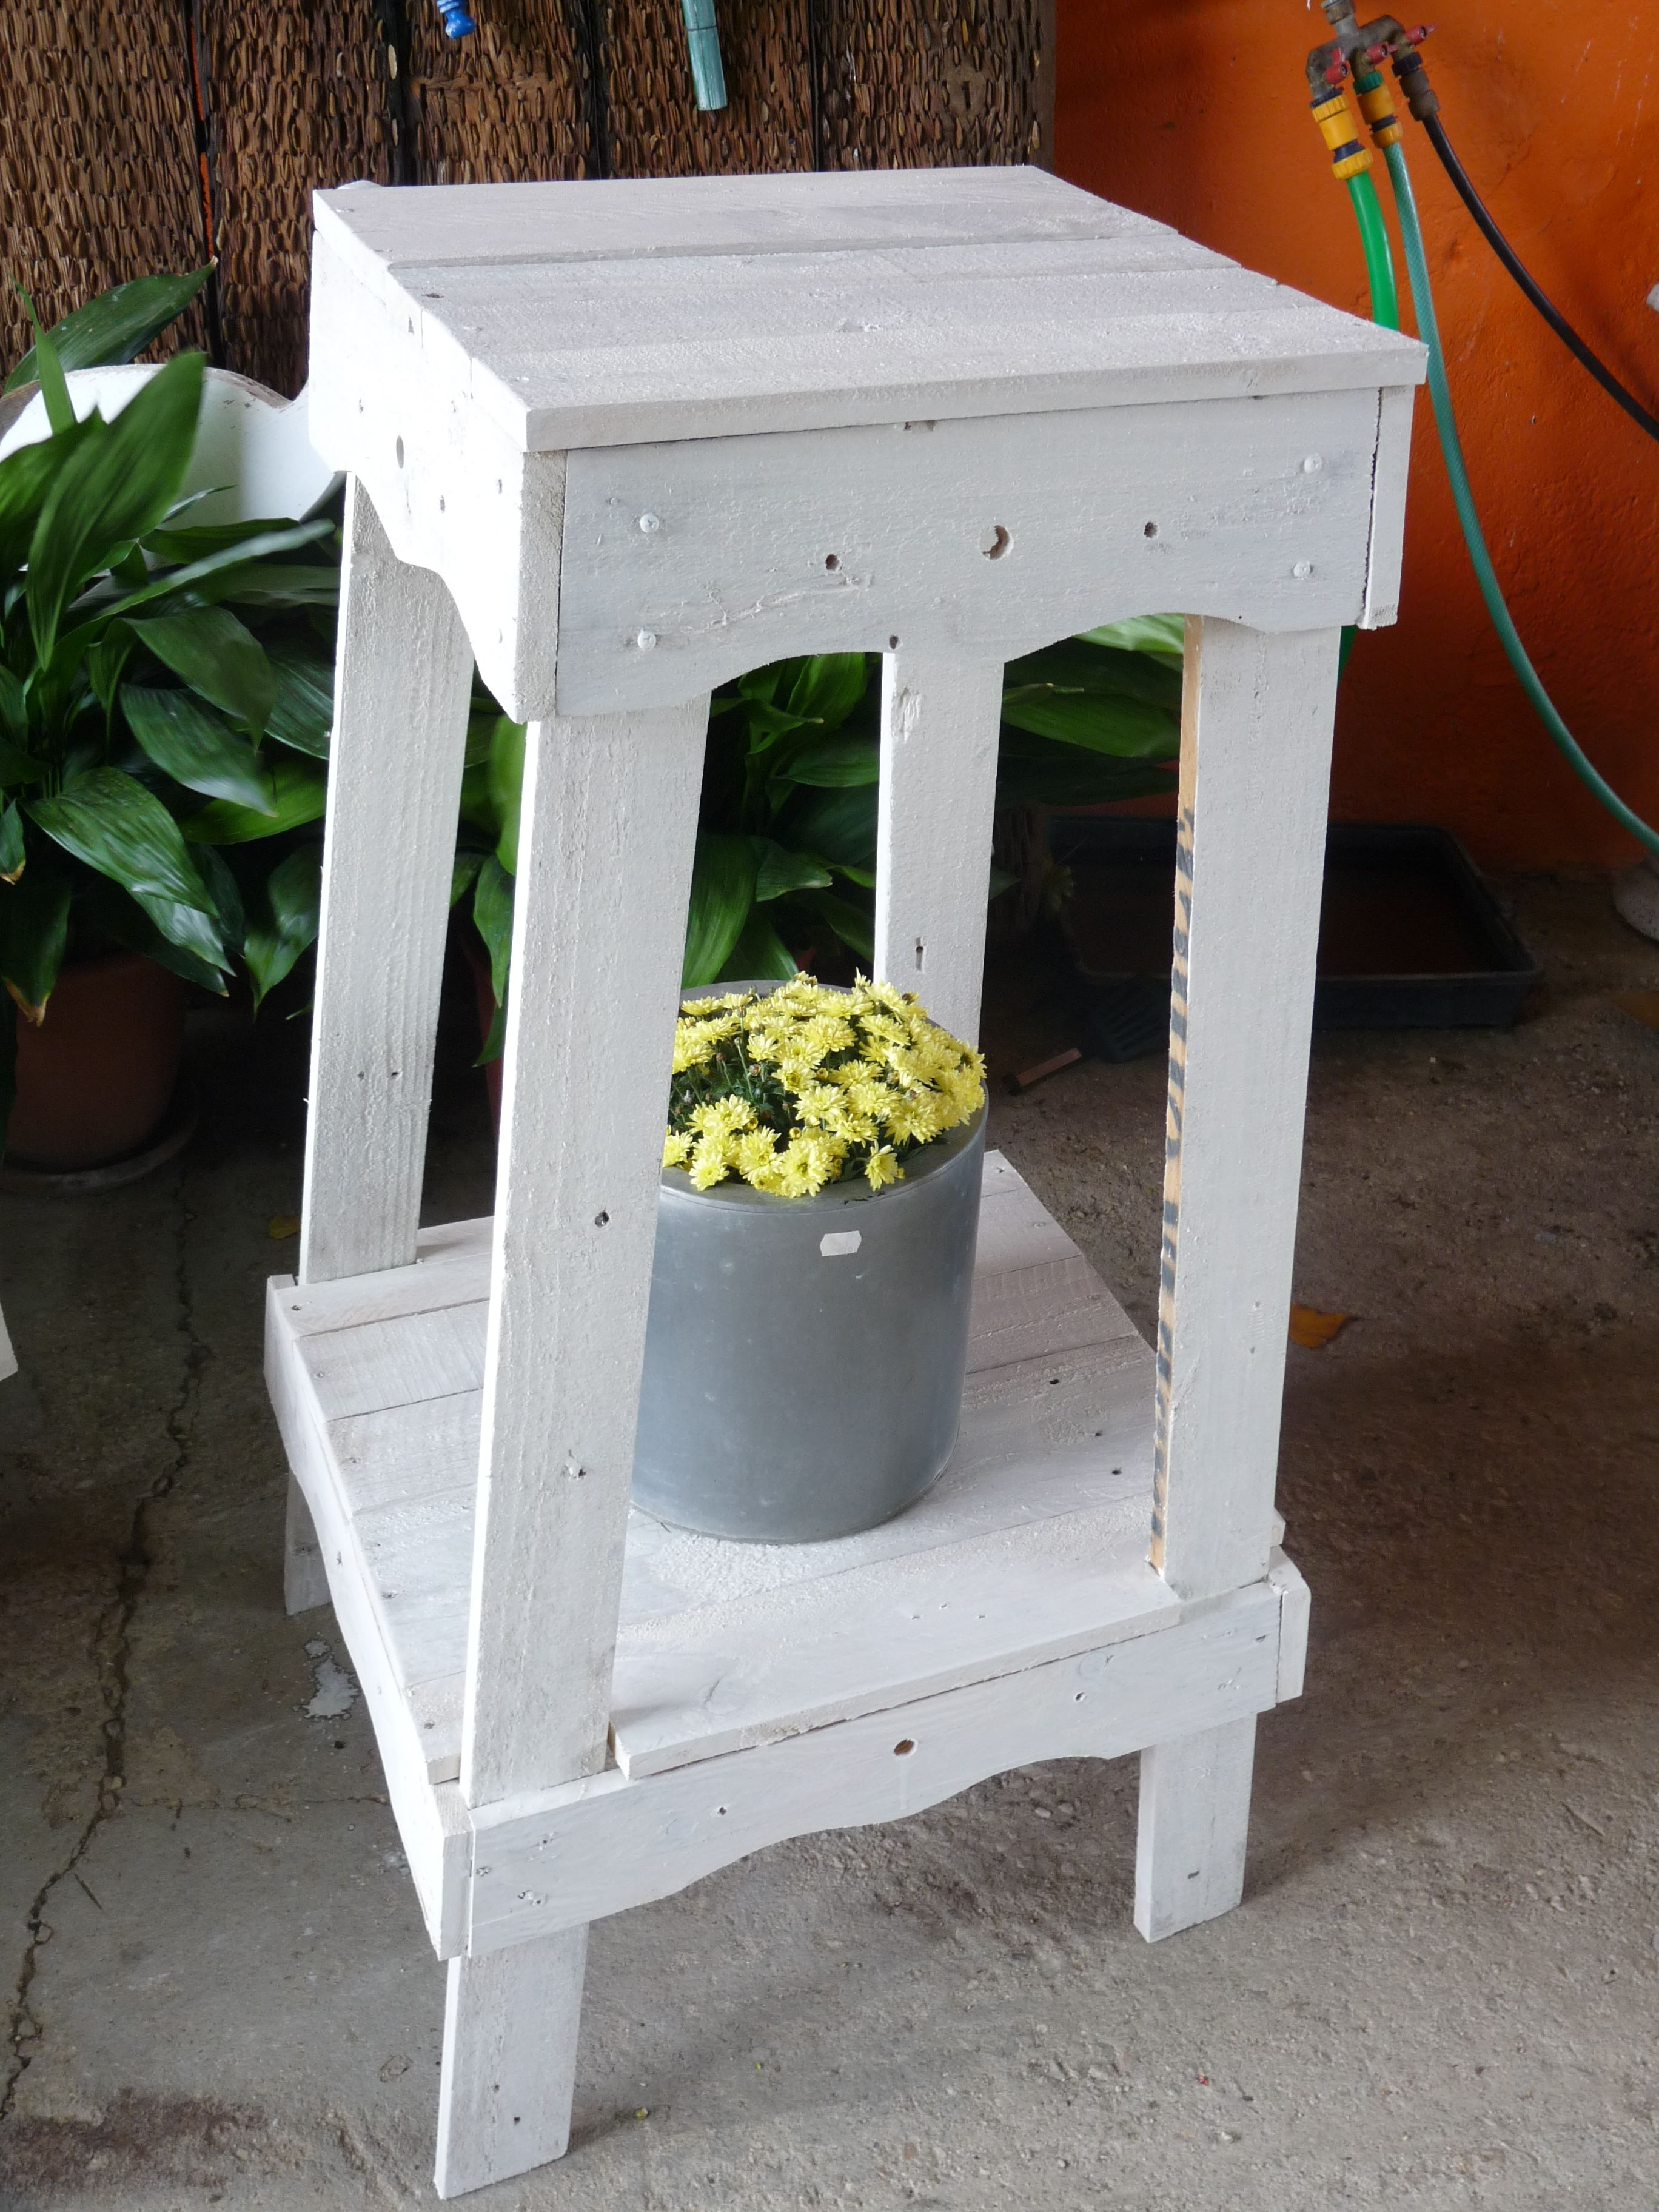 Gran Pedestal Para Colocar Macetas O Decoraci N Con Flores